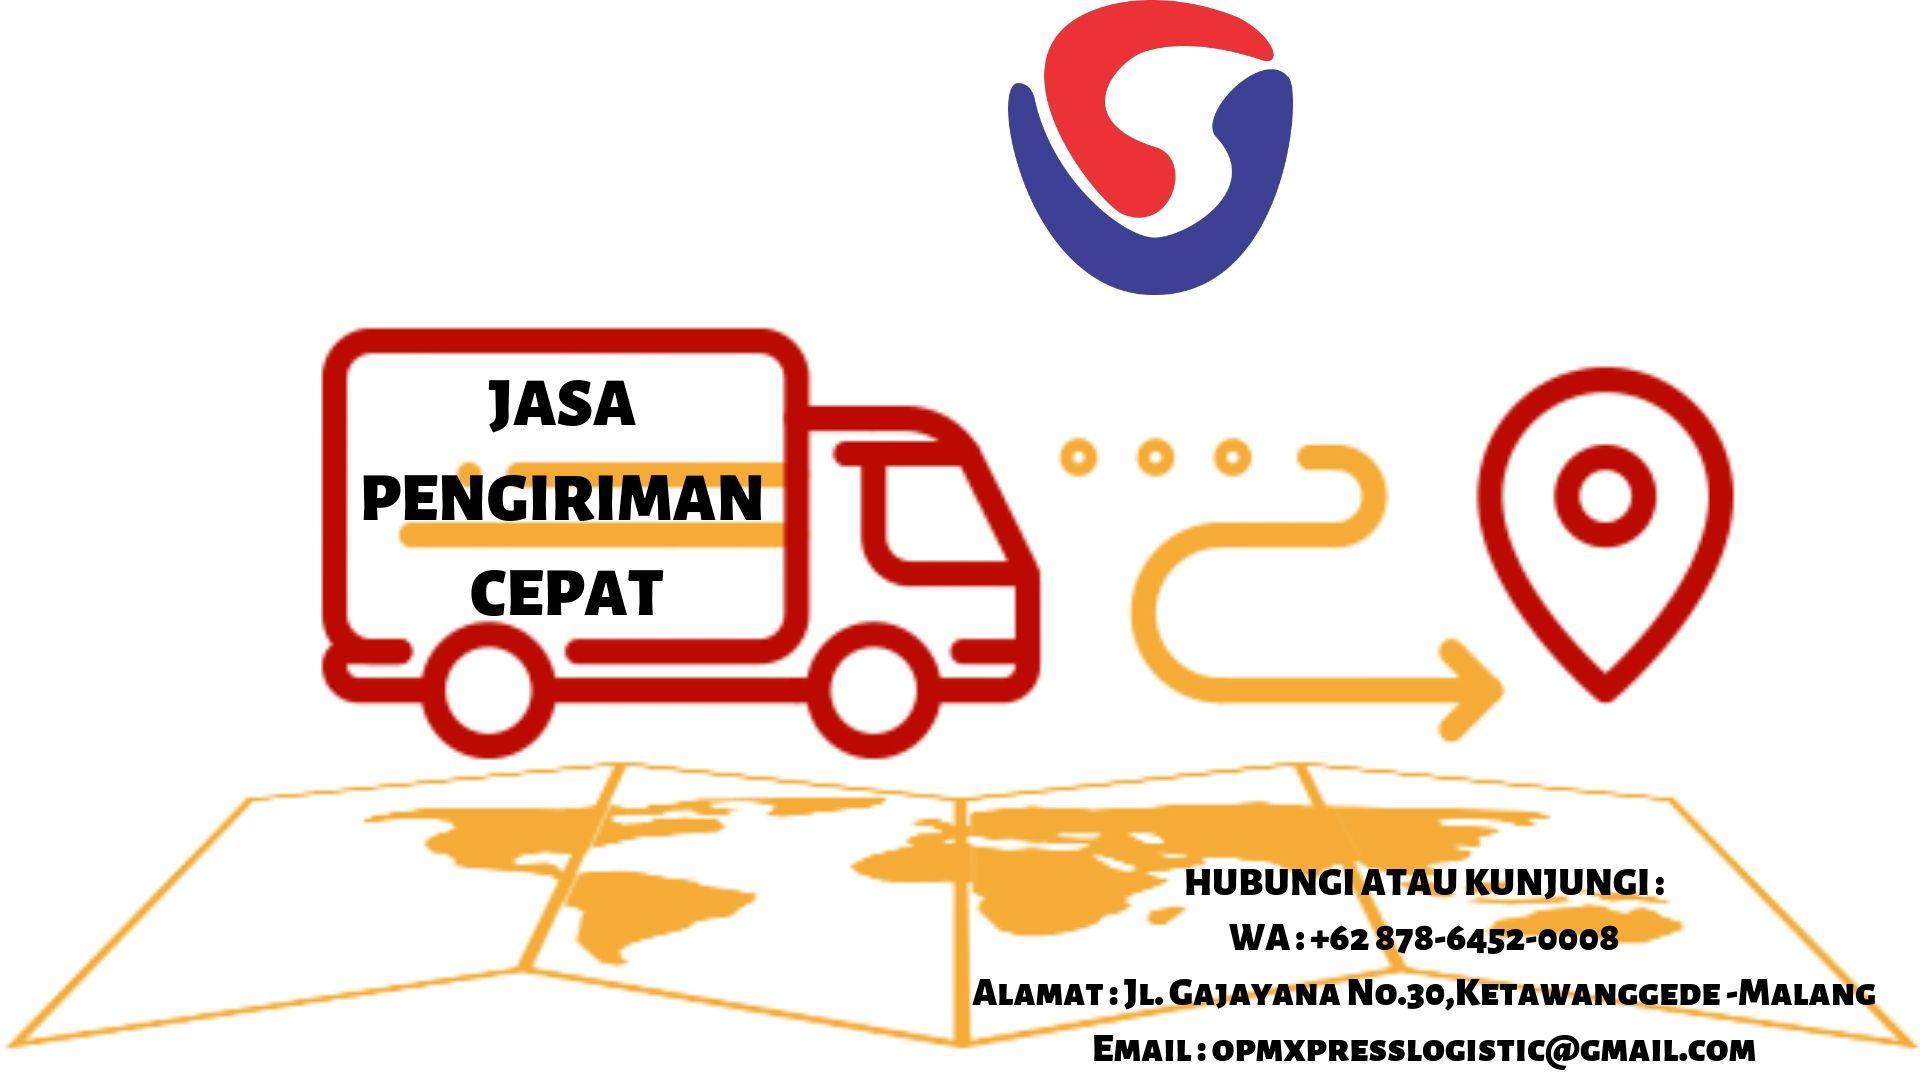 Jasa Pengiriman Cepat Malang Ke Bali Wa 62 878 6452 0008 Jasa Pengiriman Barang Terdekat Sahabat Pelayan Malang